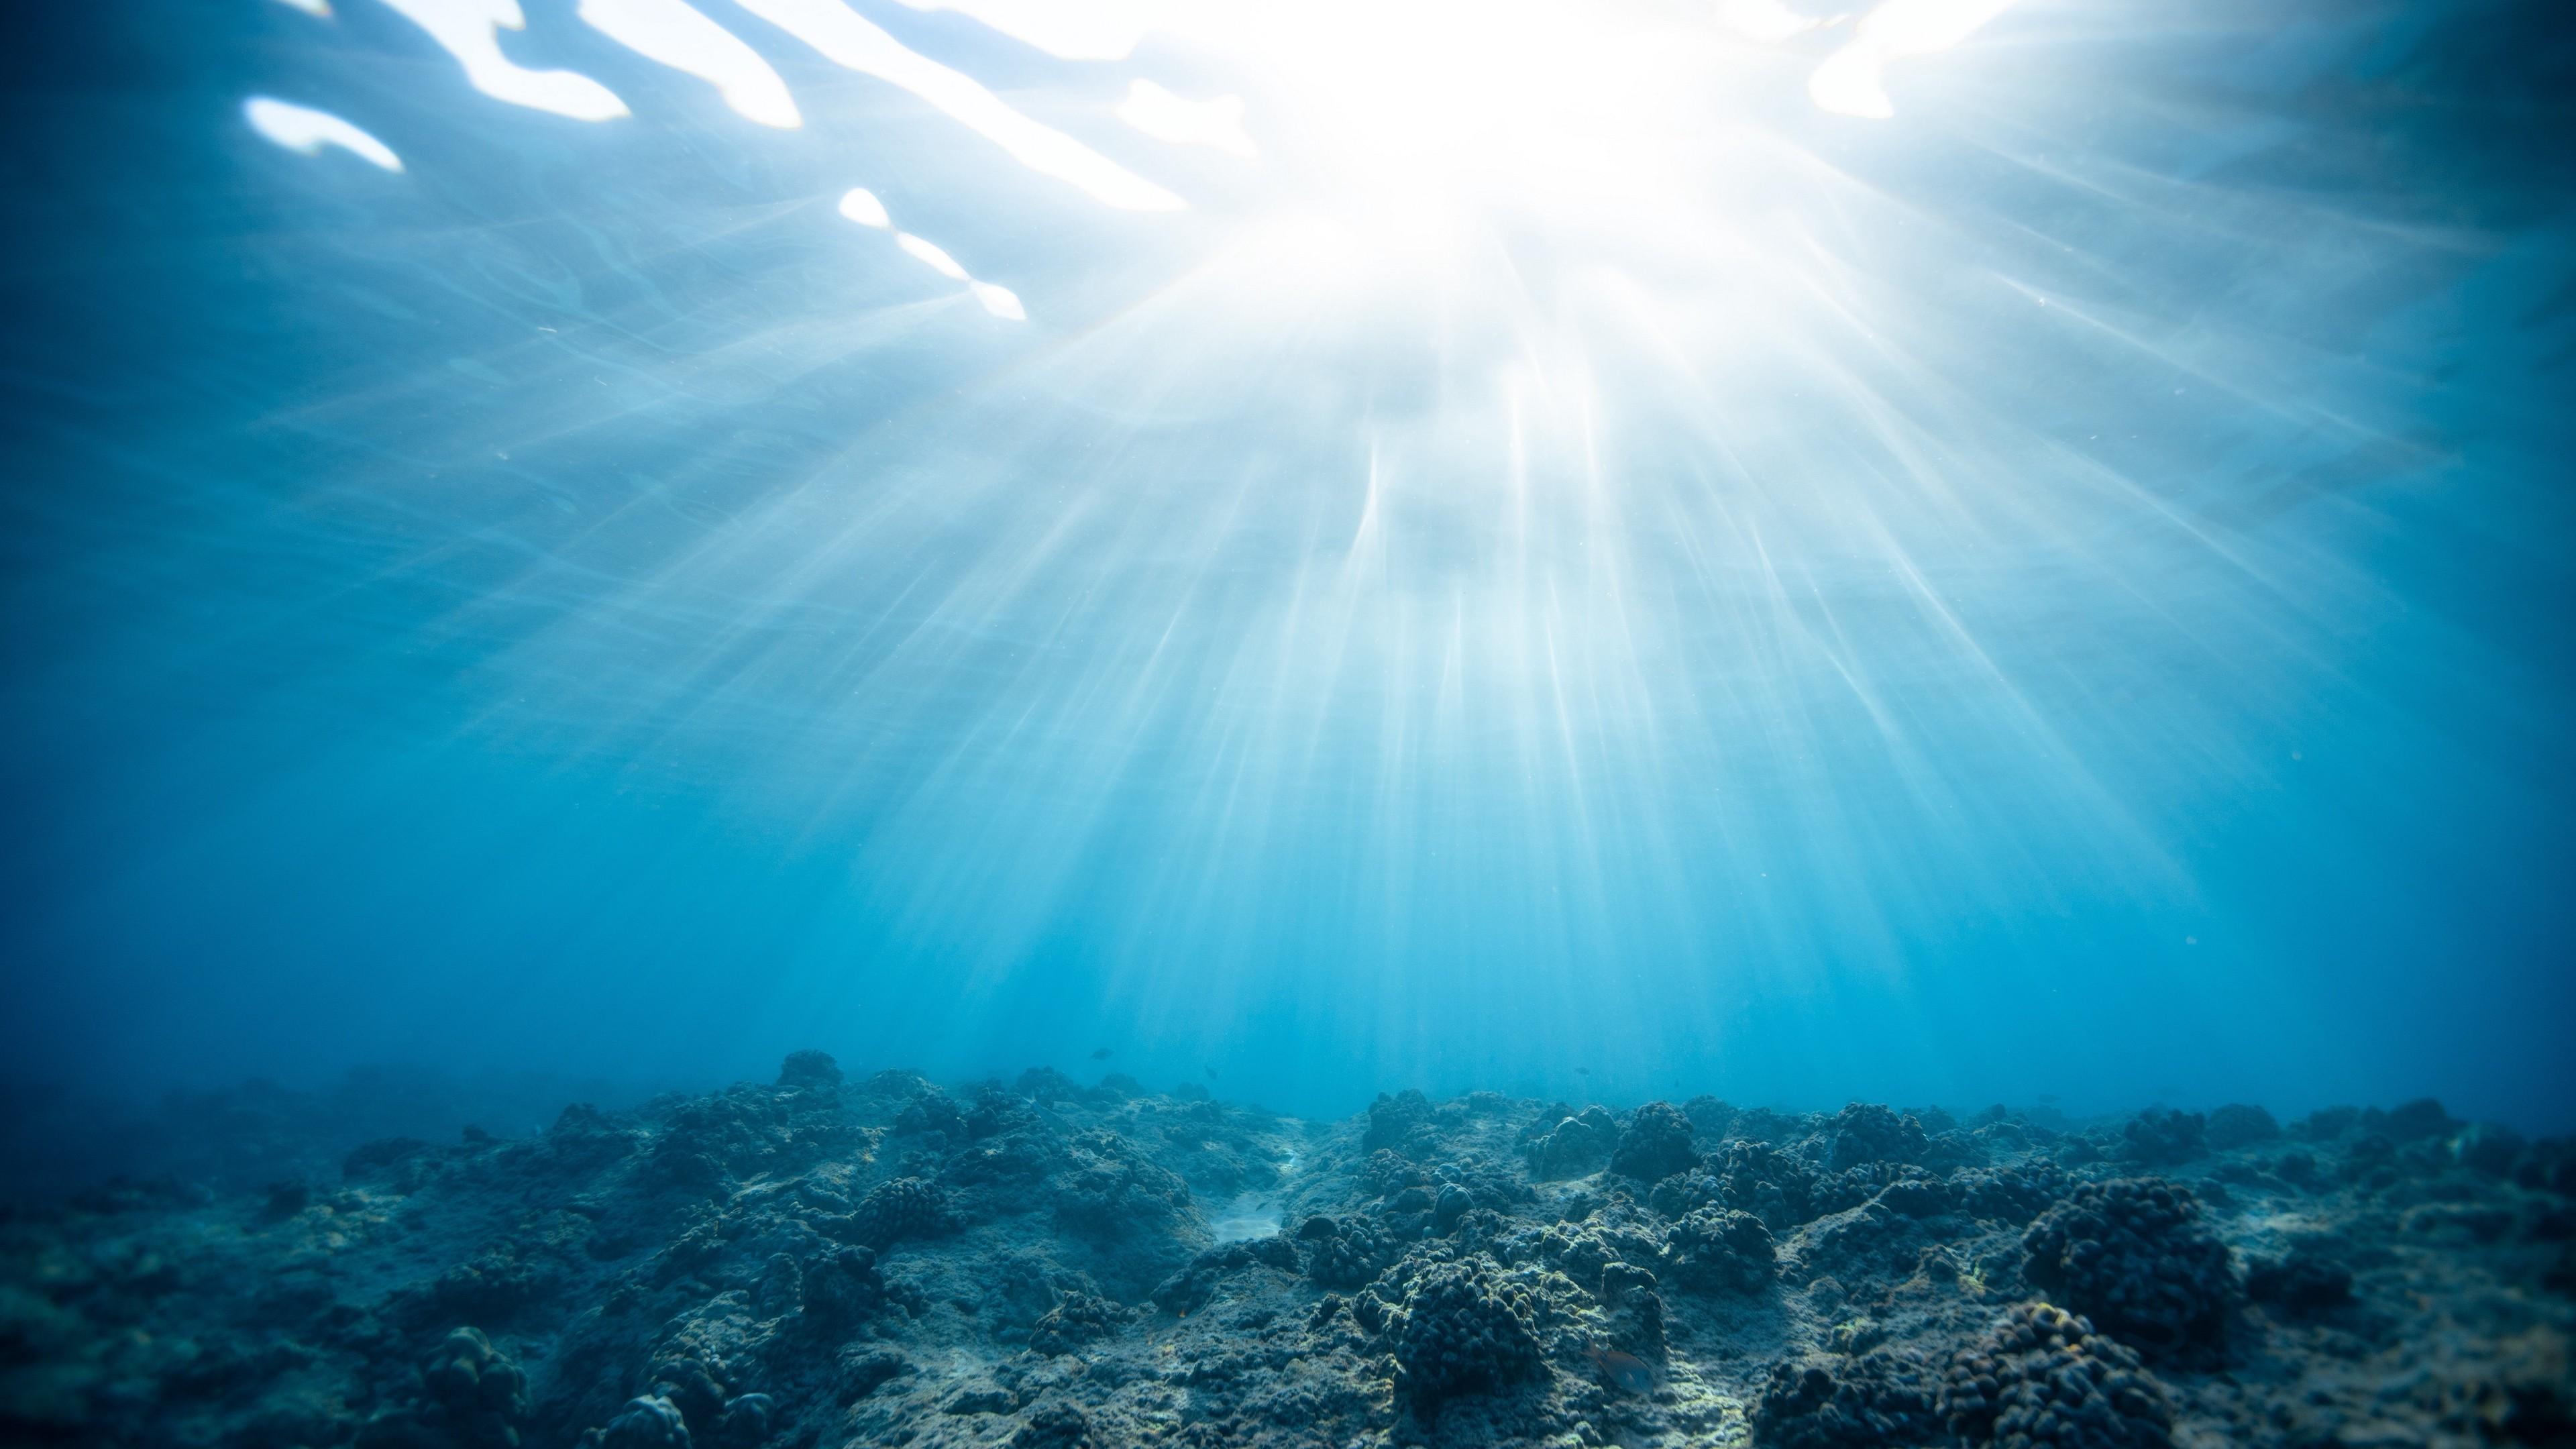 4k Underwater World Ocean Corals Wallpaper 3840x2160